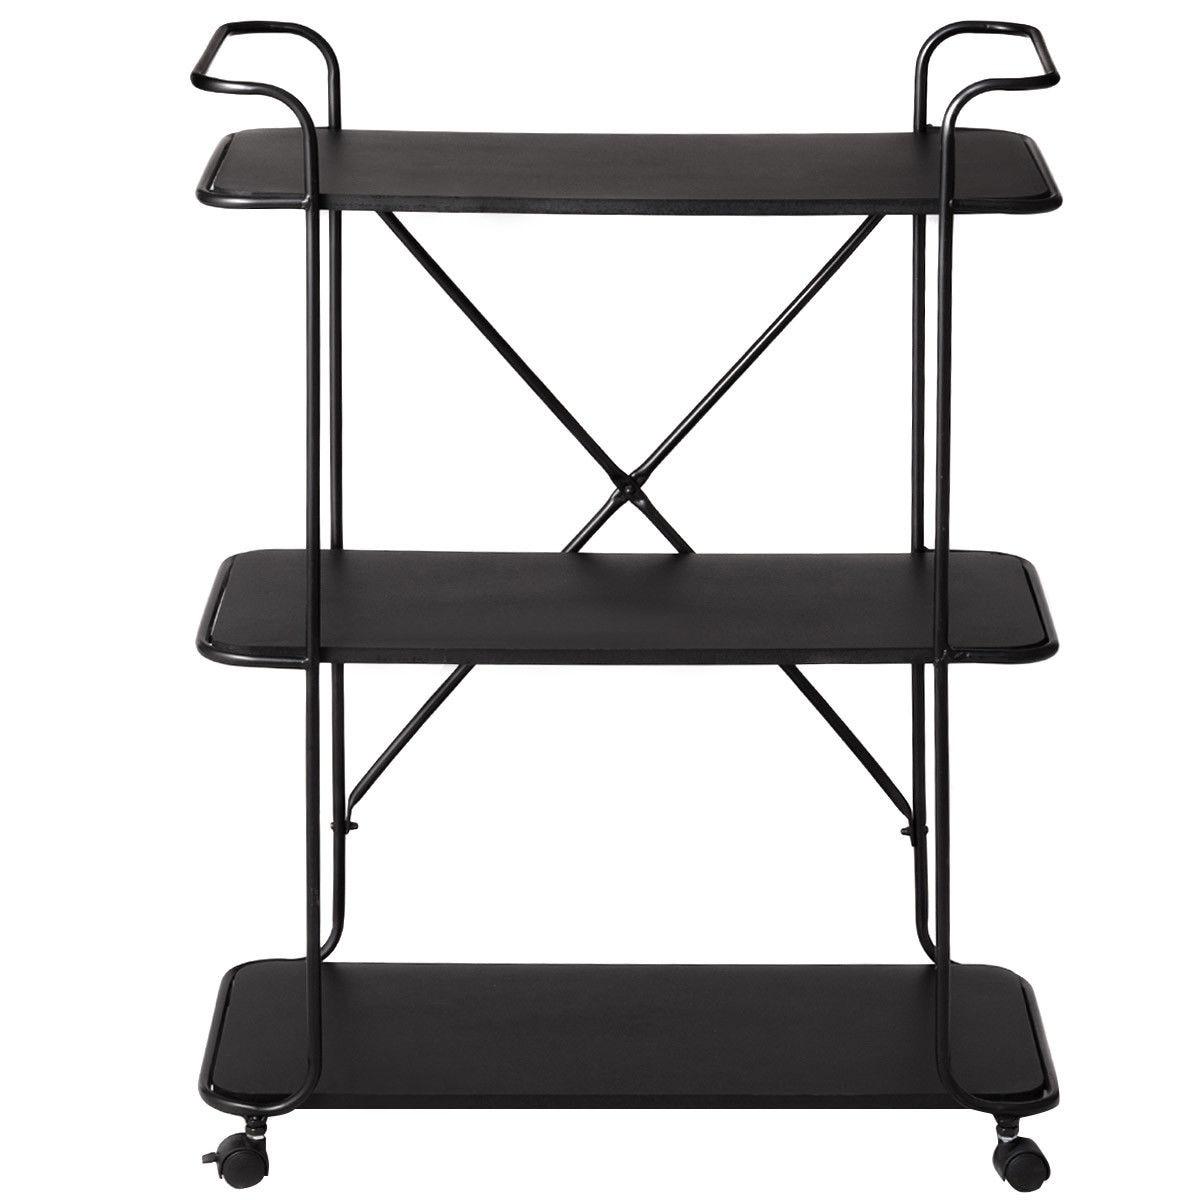 Giantex 3 Tier Metal Portable Rolling Cart Storage Rack Living Room Bookshelf Display Utility Organizer HW56050BK In Bookcases From Furniture On